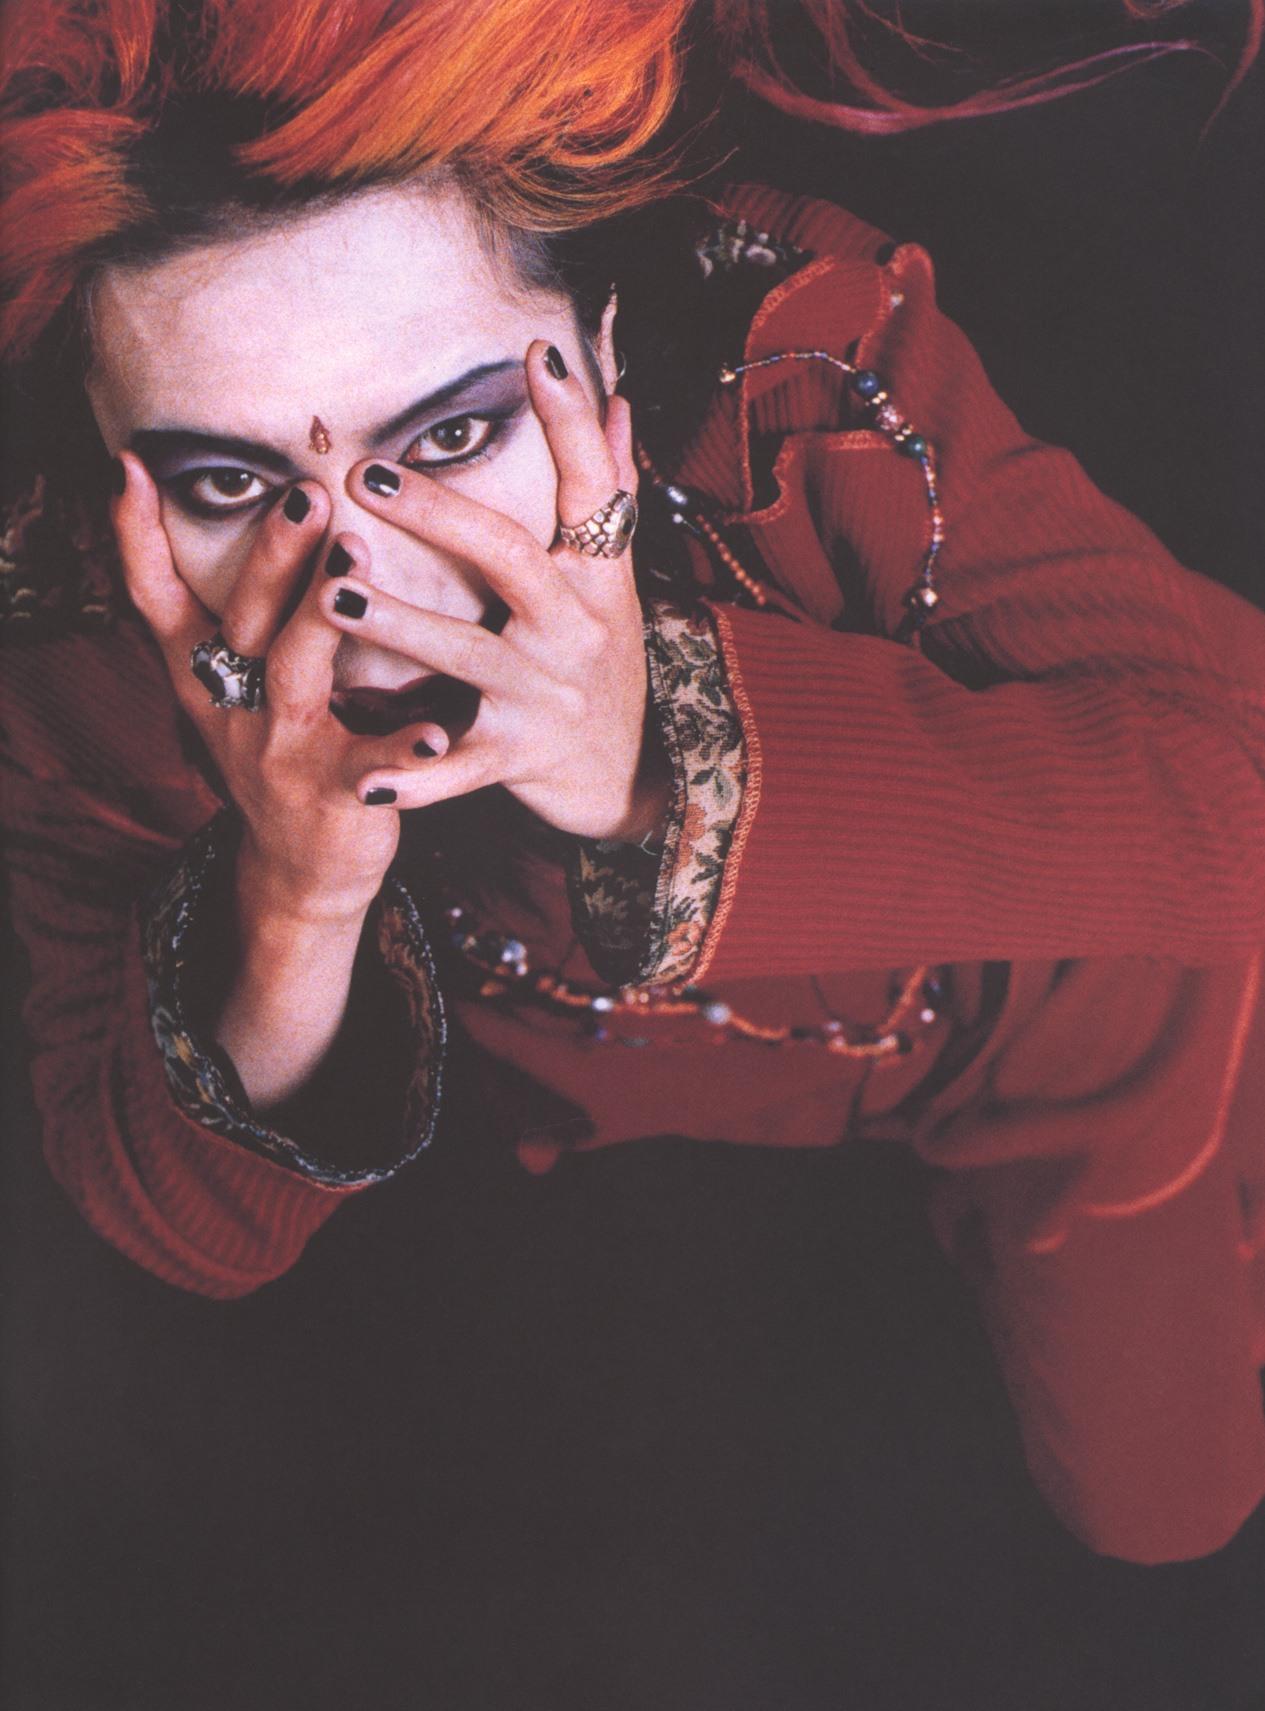 Hide X Japan - Страница 2 Rockit17-hide-12